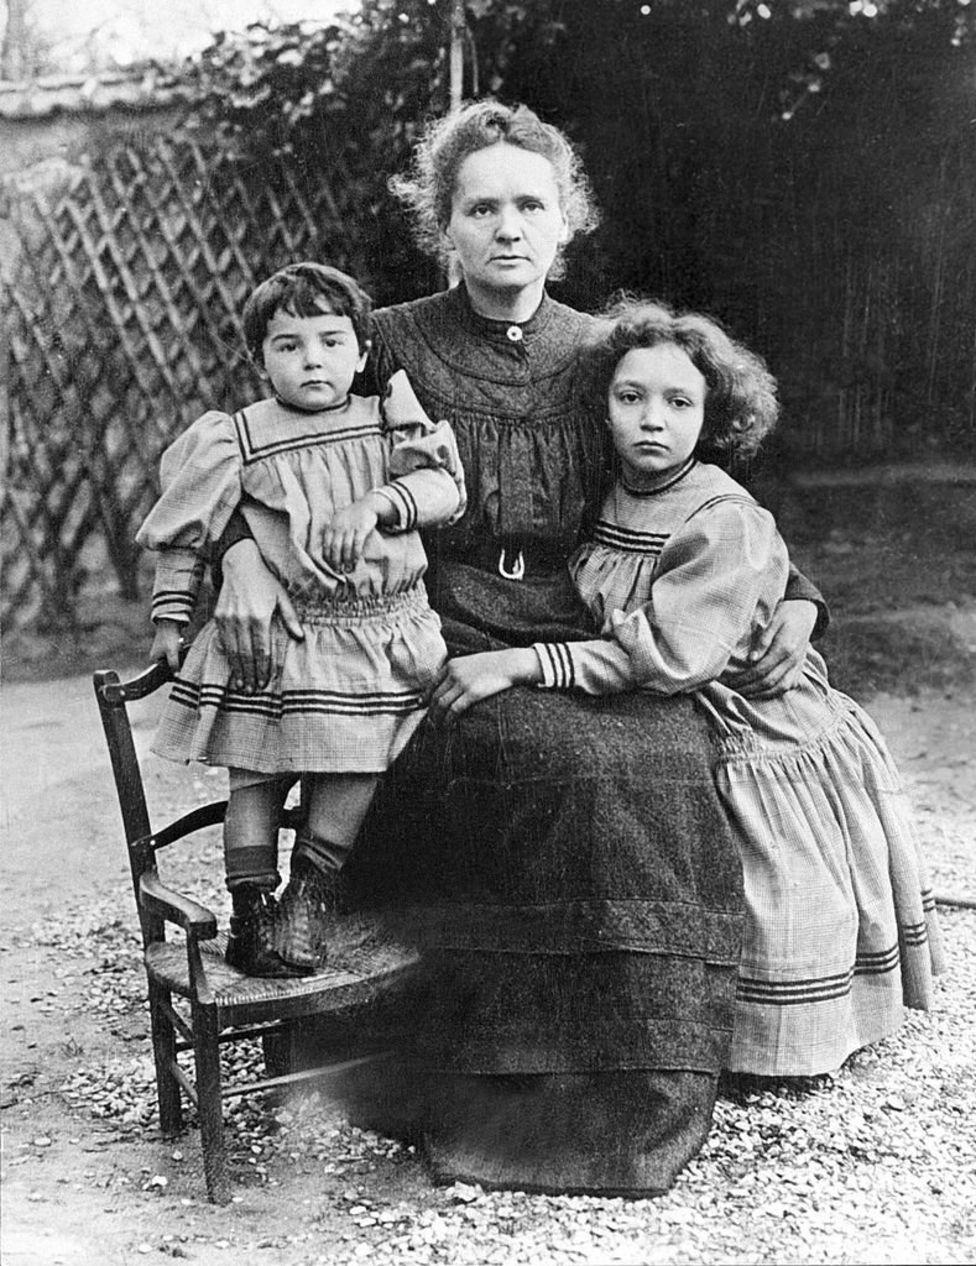 Marie Curie con sus hijas, Irene y Eve